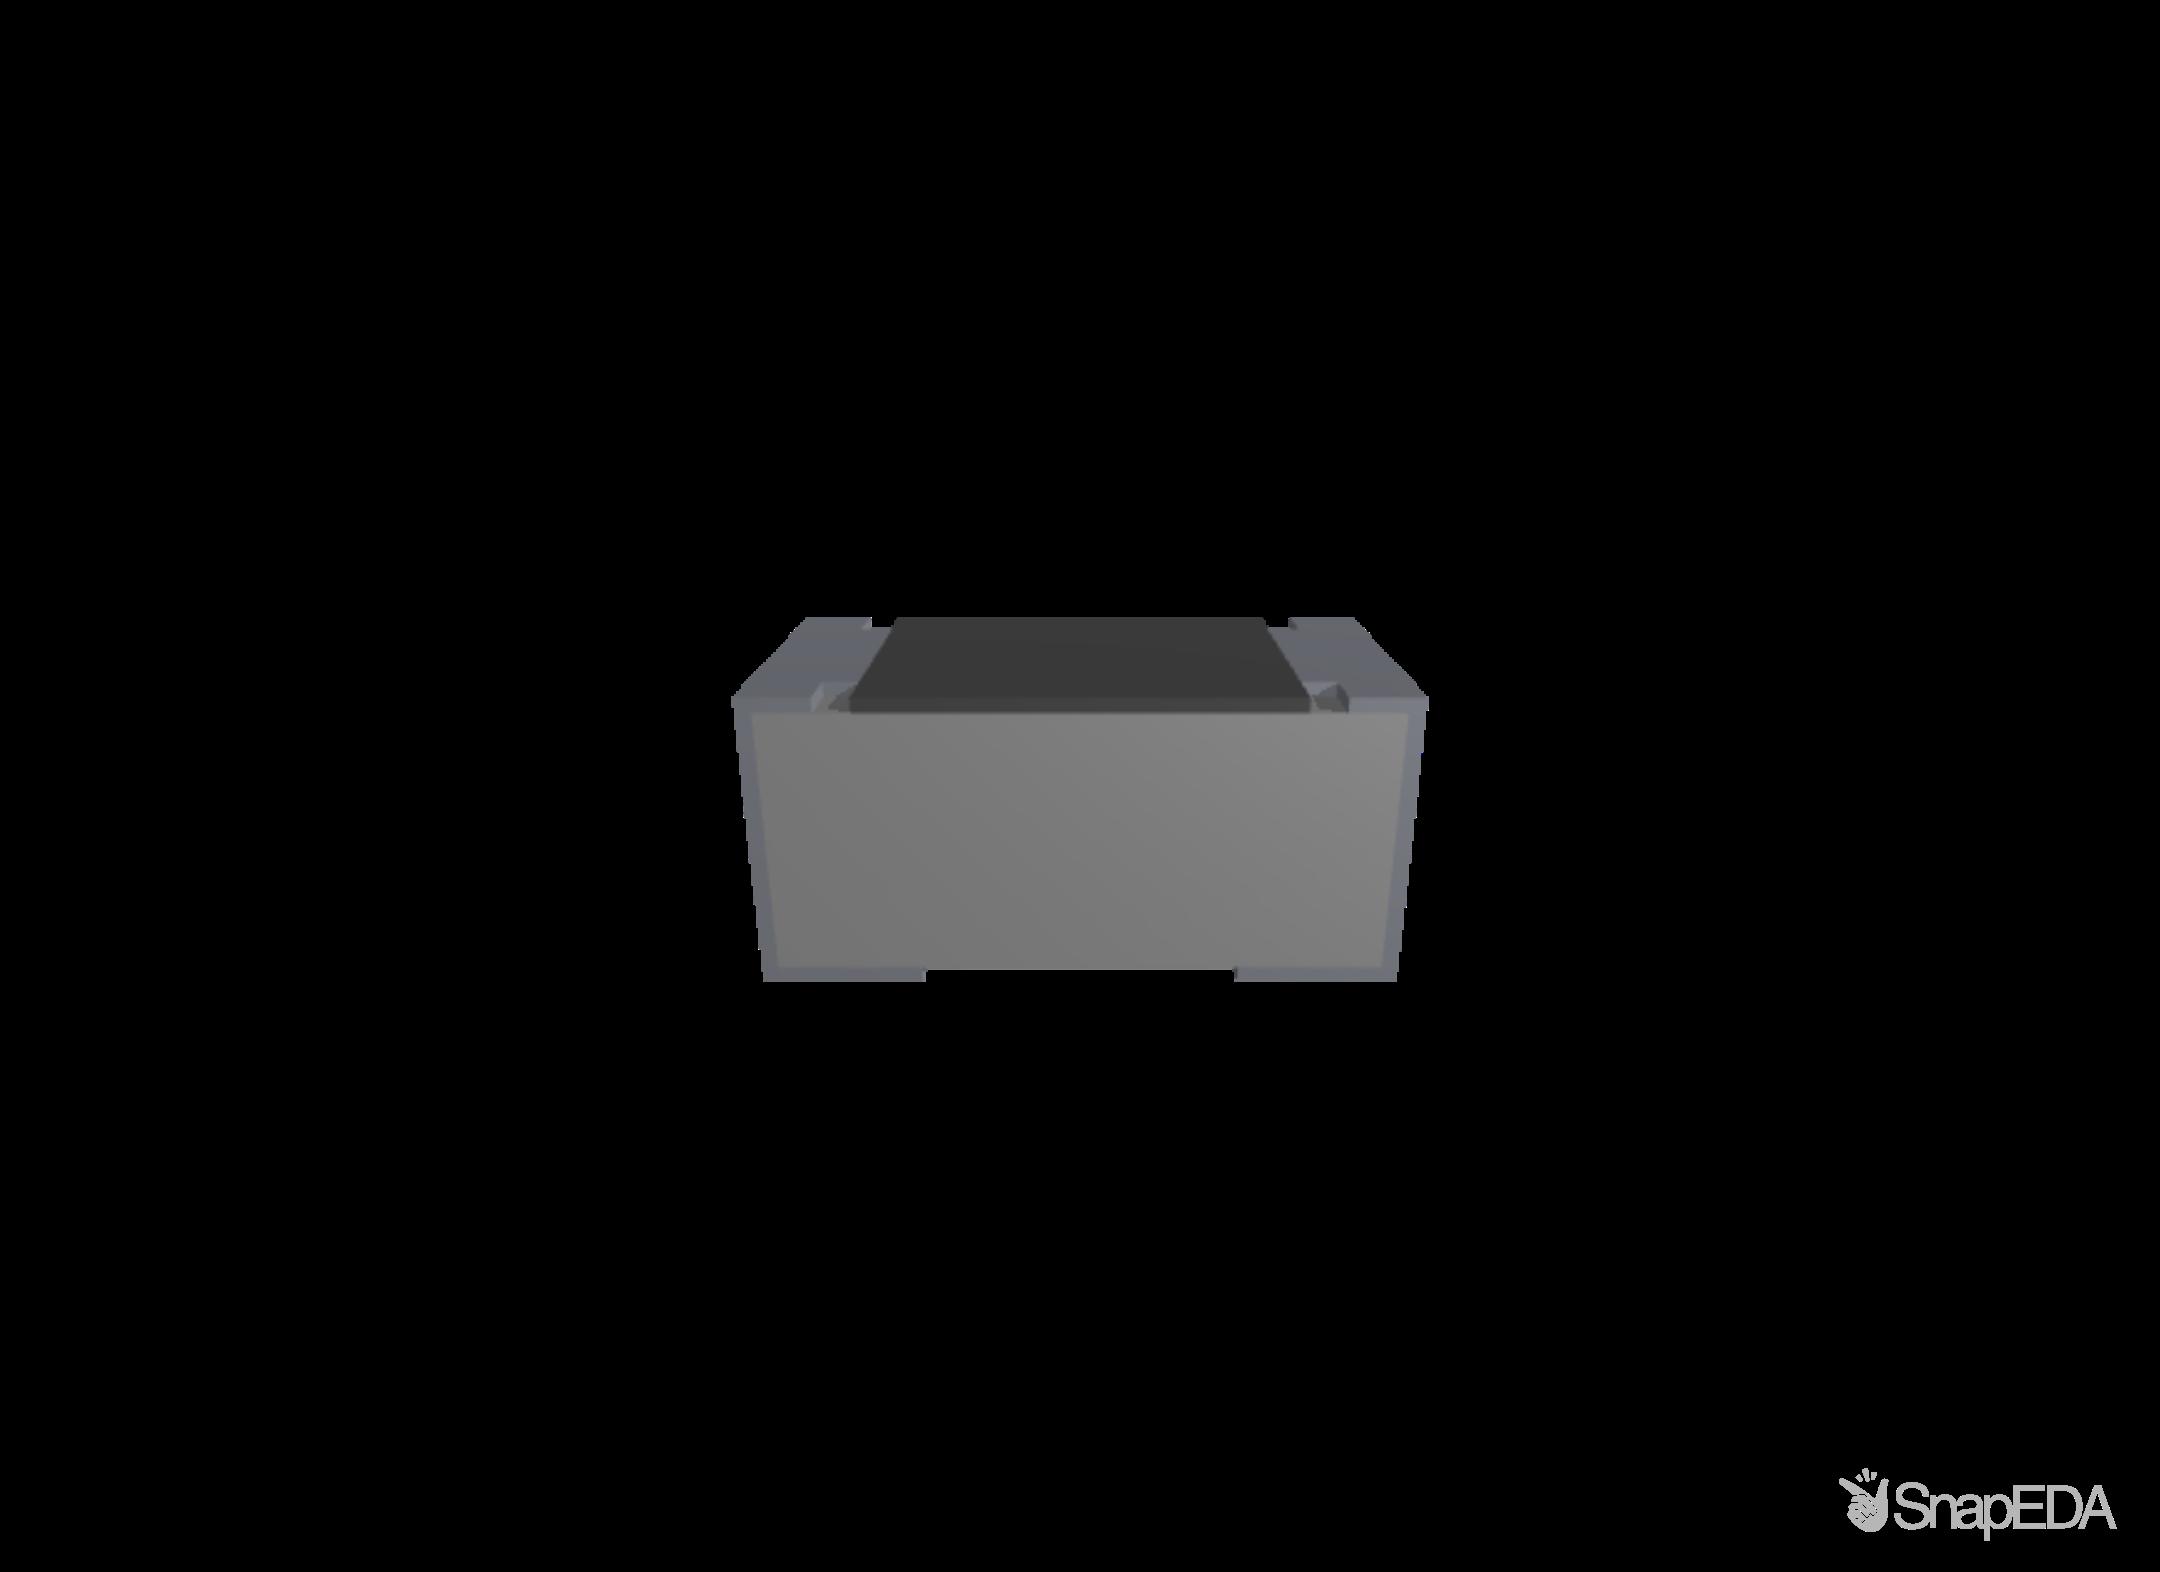 CRCW02011K00FKED 3D Model